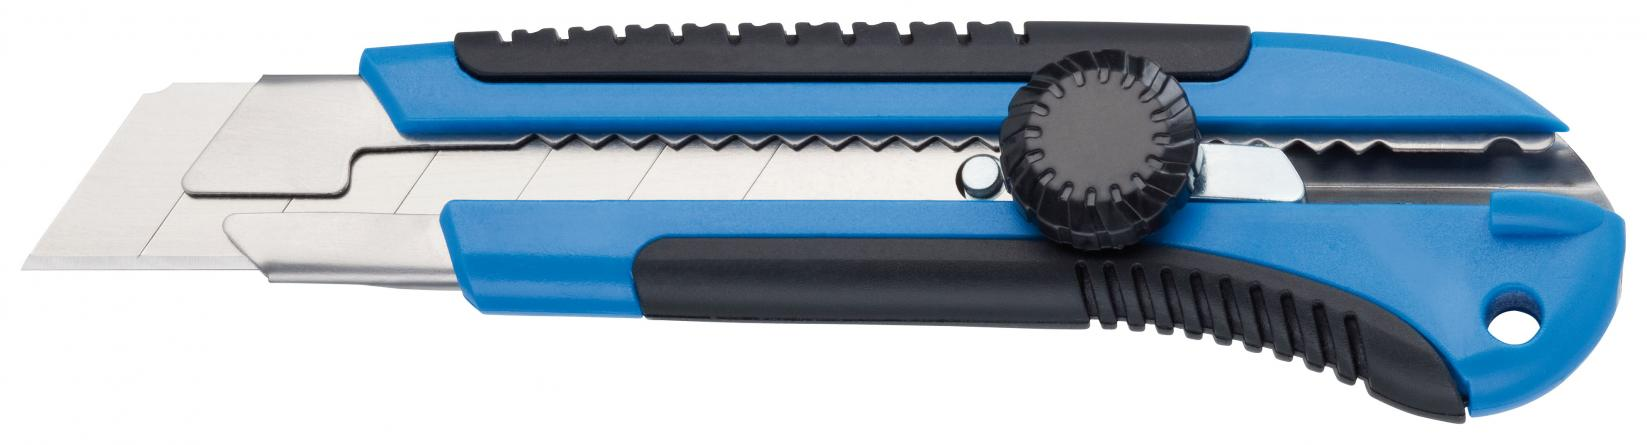 Storch Expert  Нож с отламываемыми лезвиями, 18мм 356115